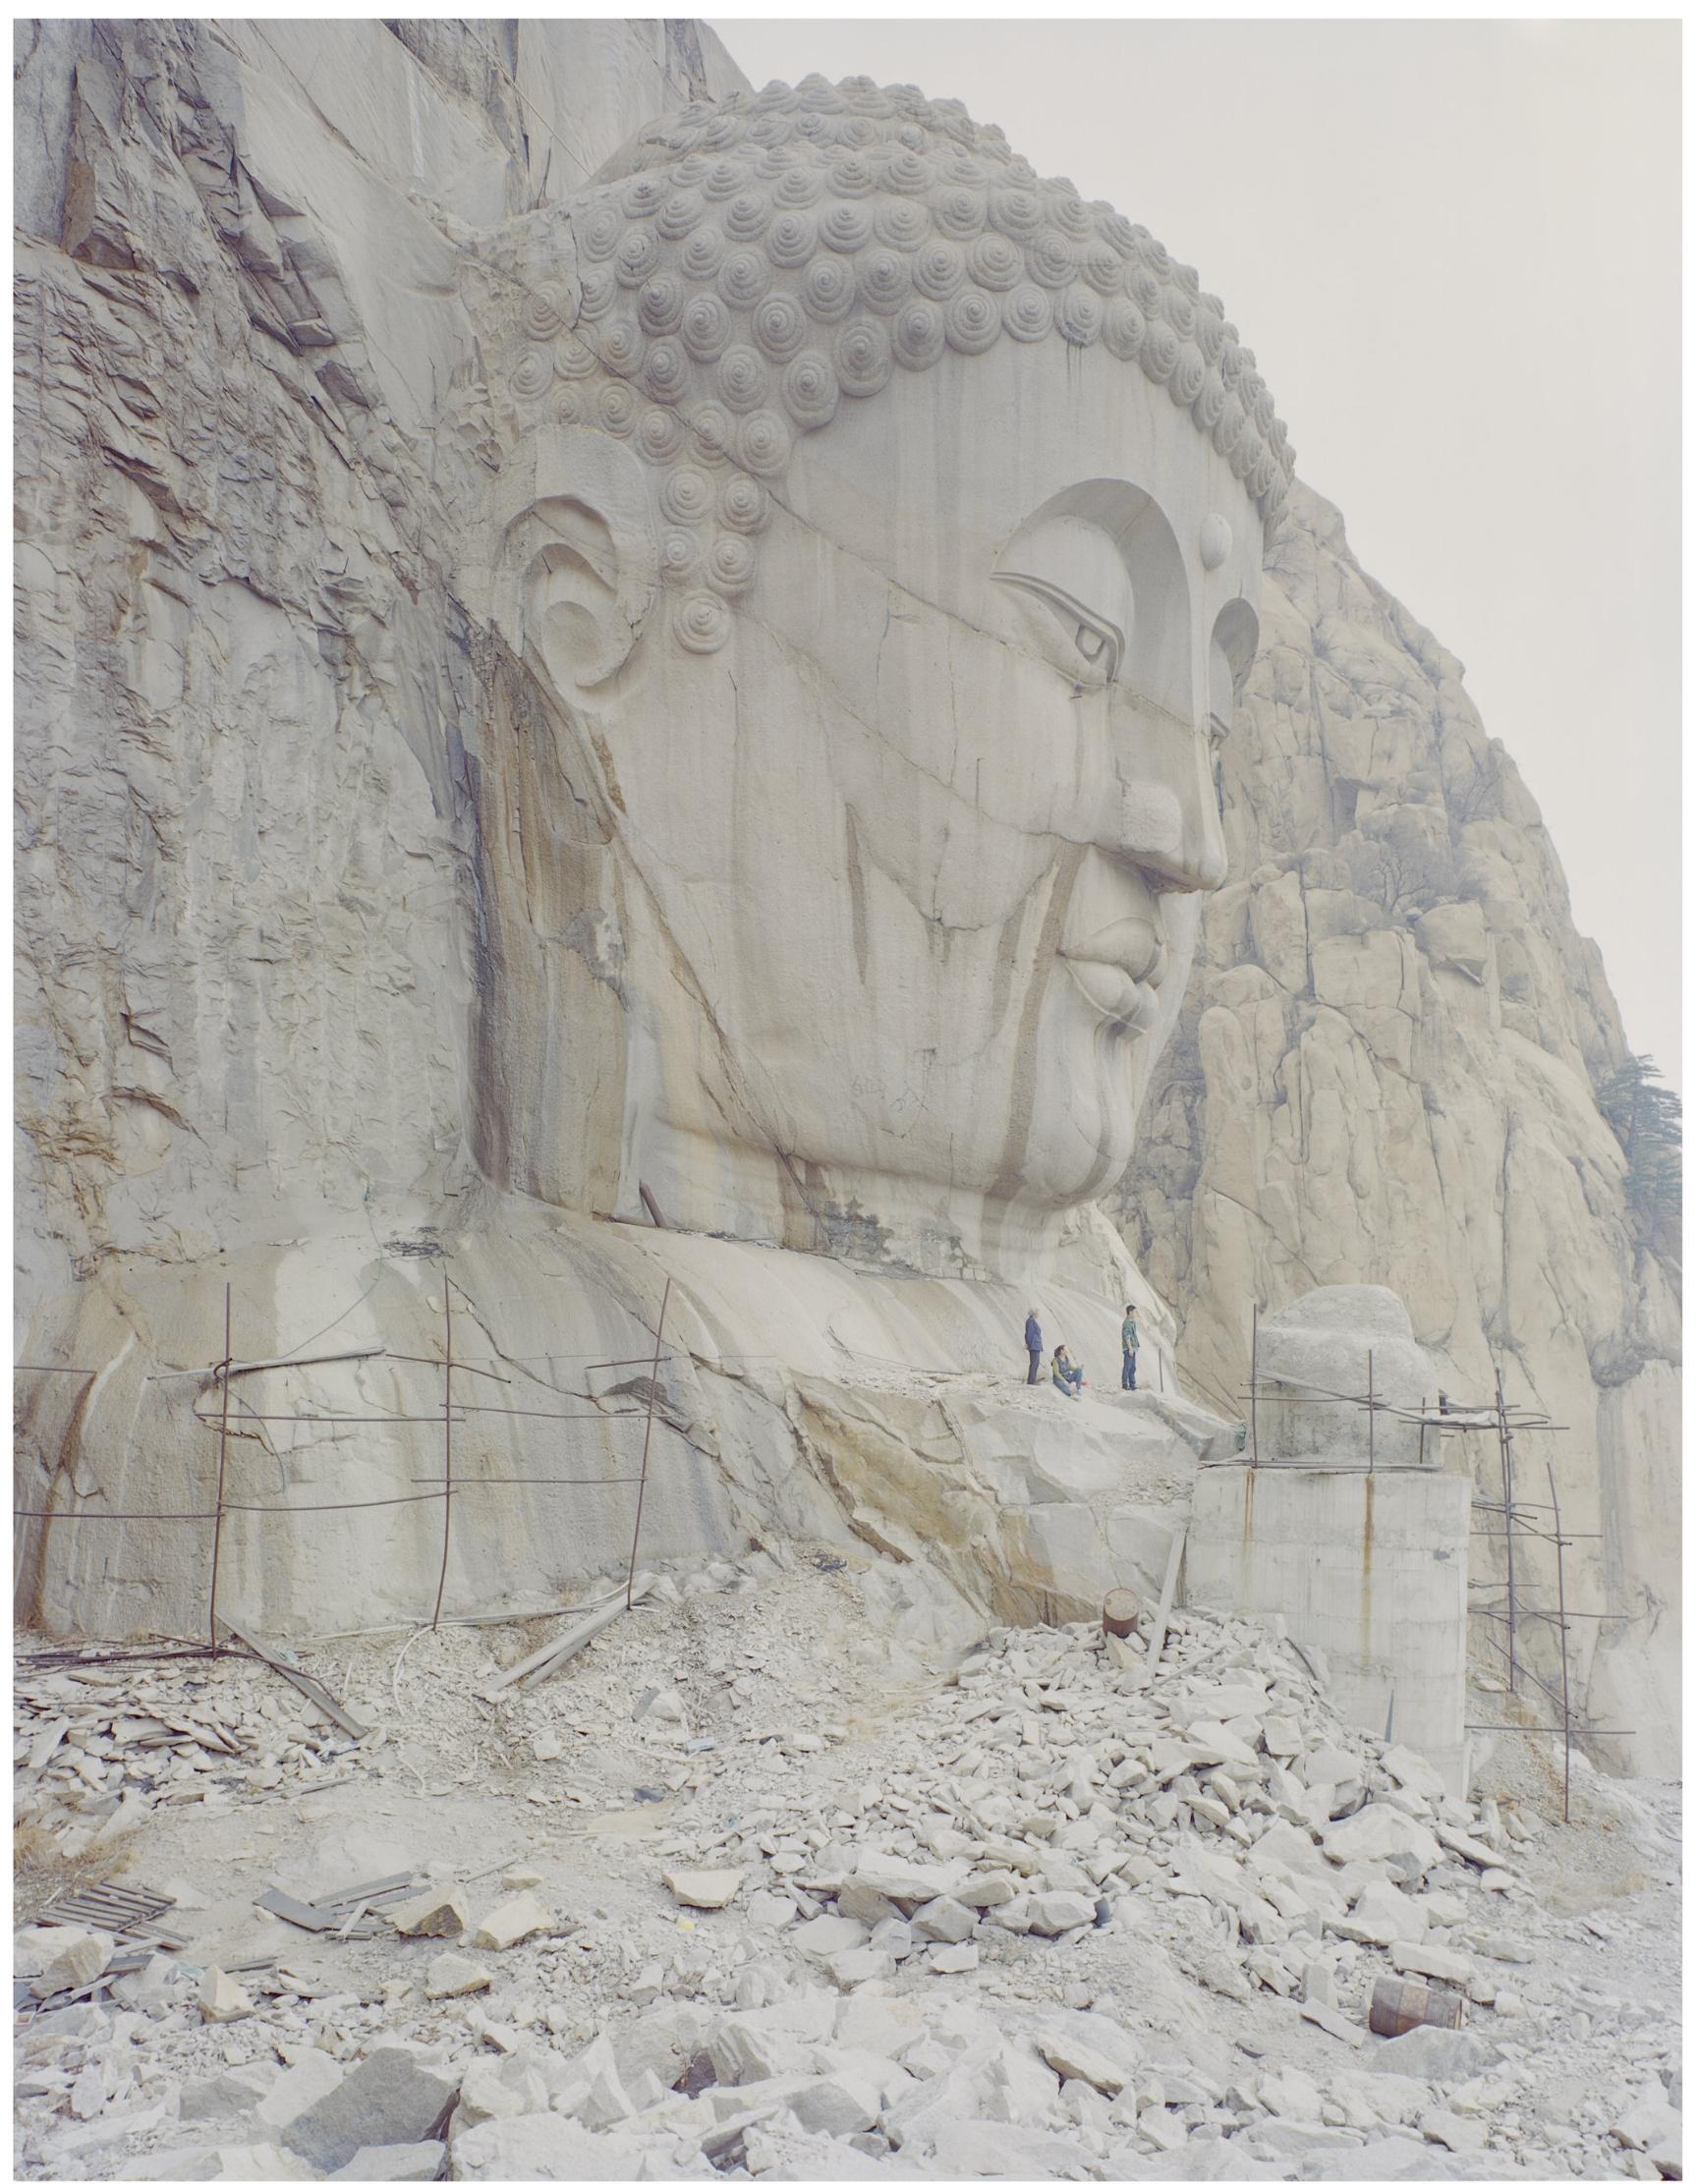 山中的佛像, 90 x 120厘米 / 108 x 134  厘米  / 135 x 167  厘米